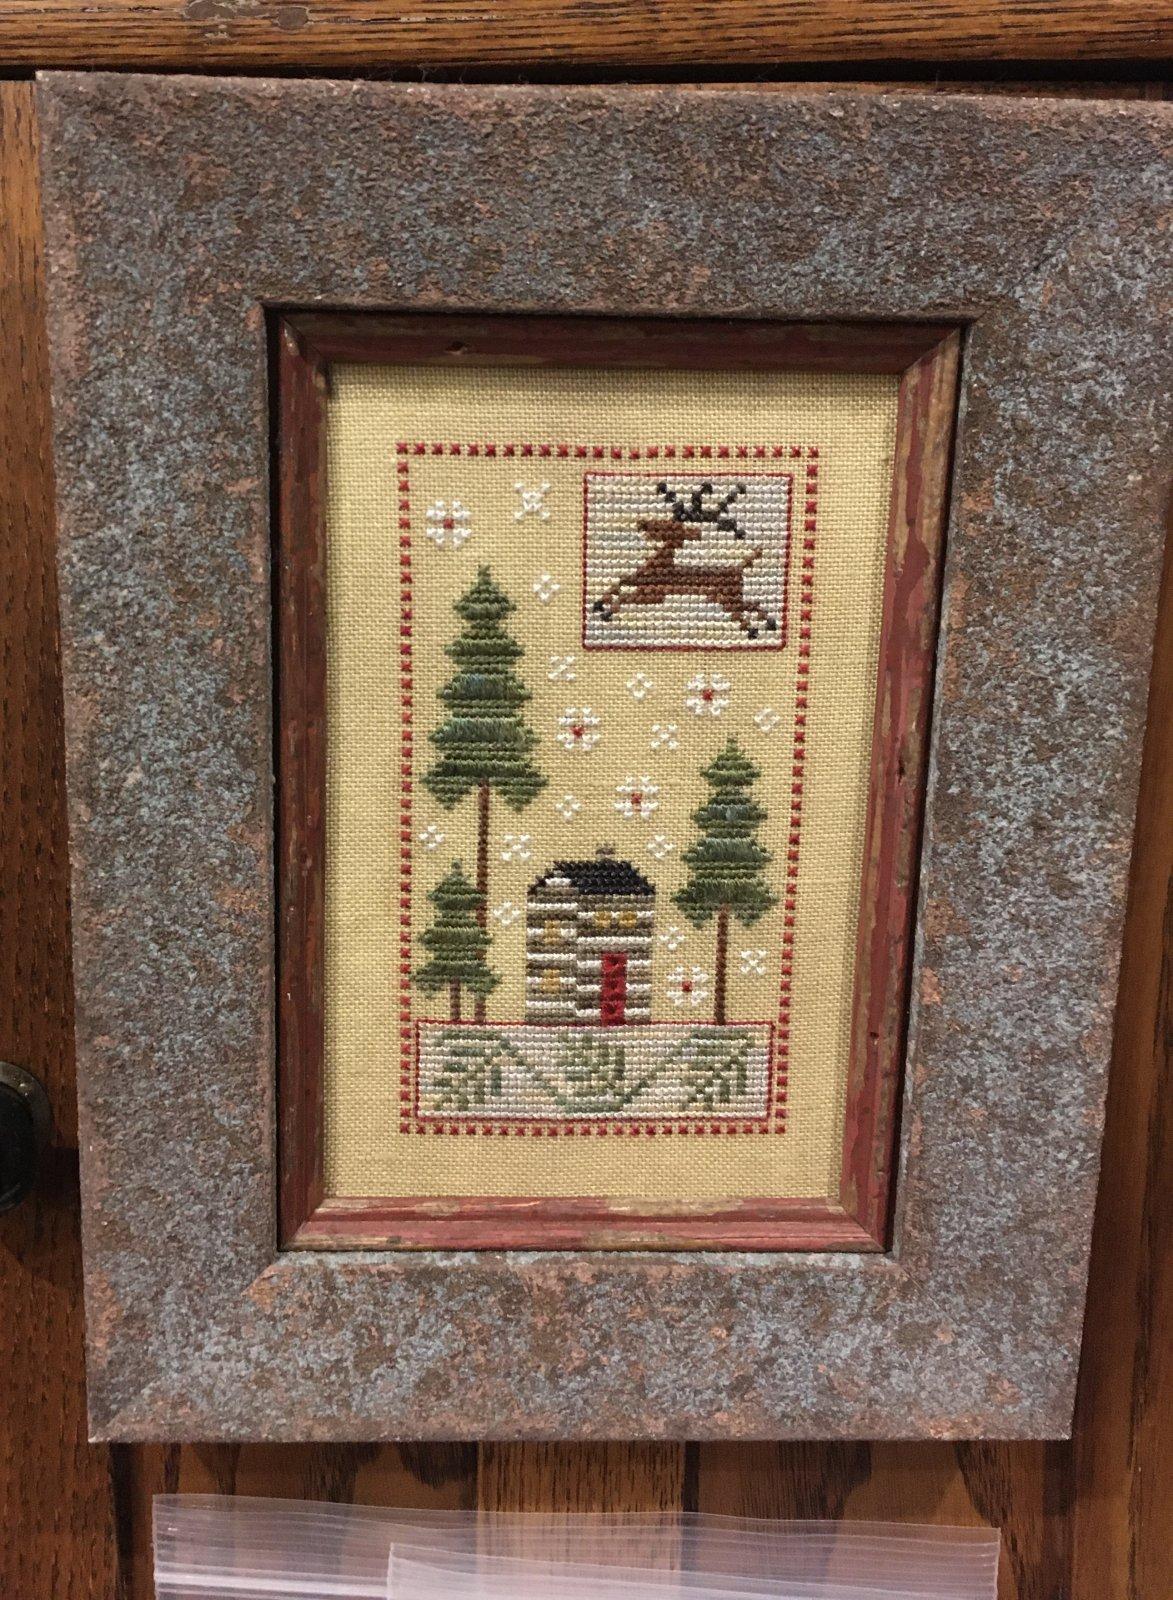 Christmas Cabin kit